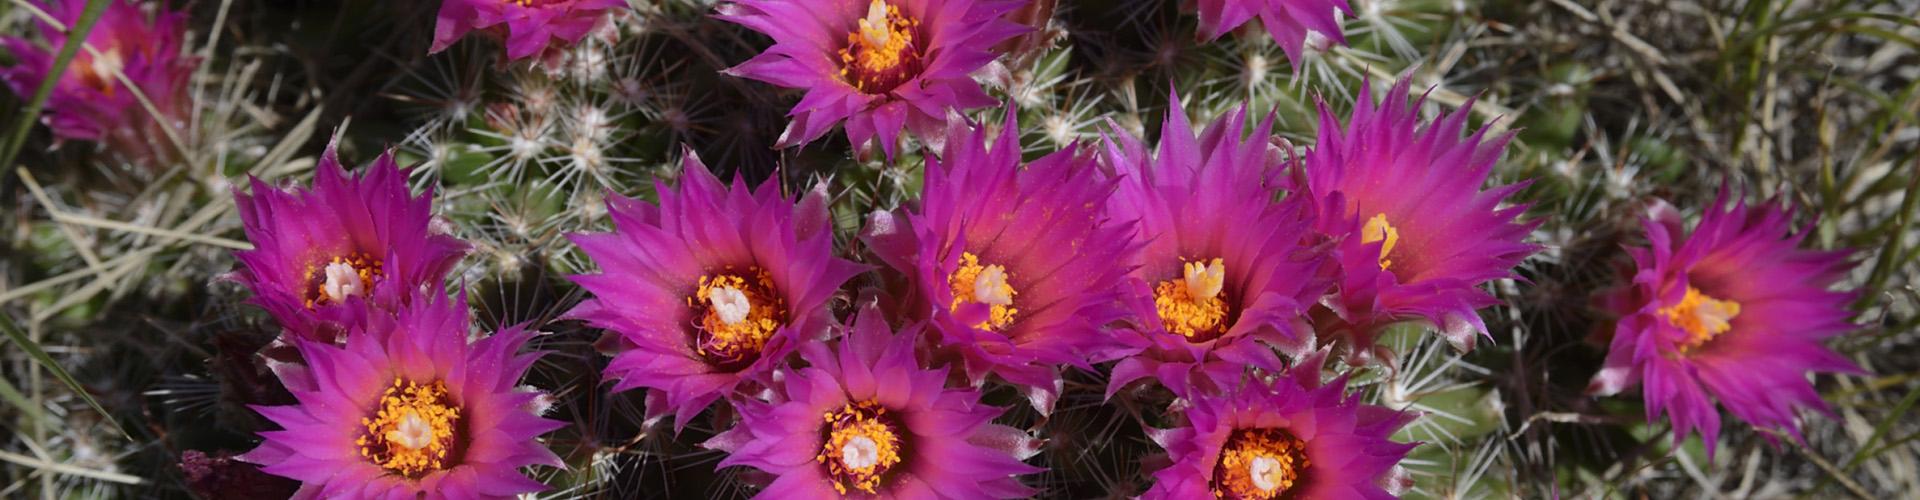 Pincushion cactus, Saskatchewan